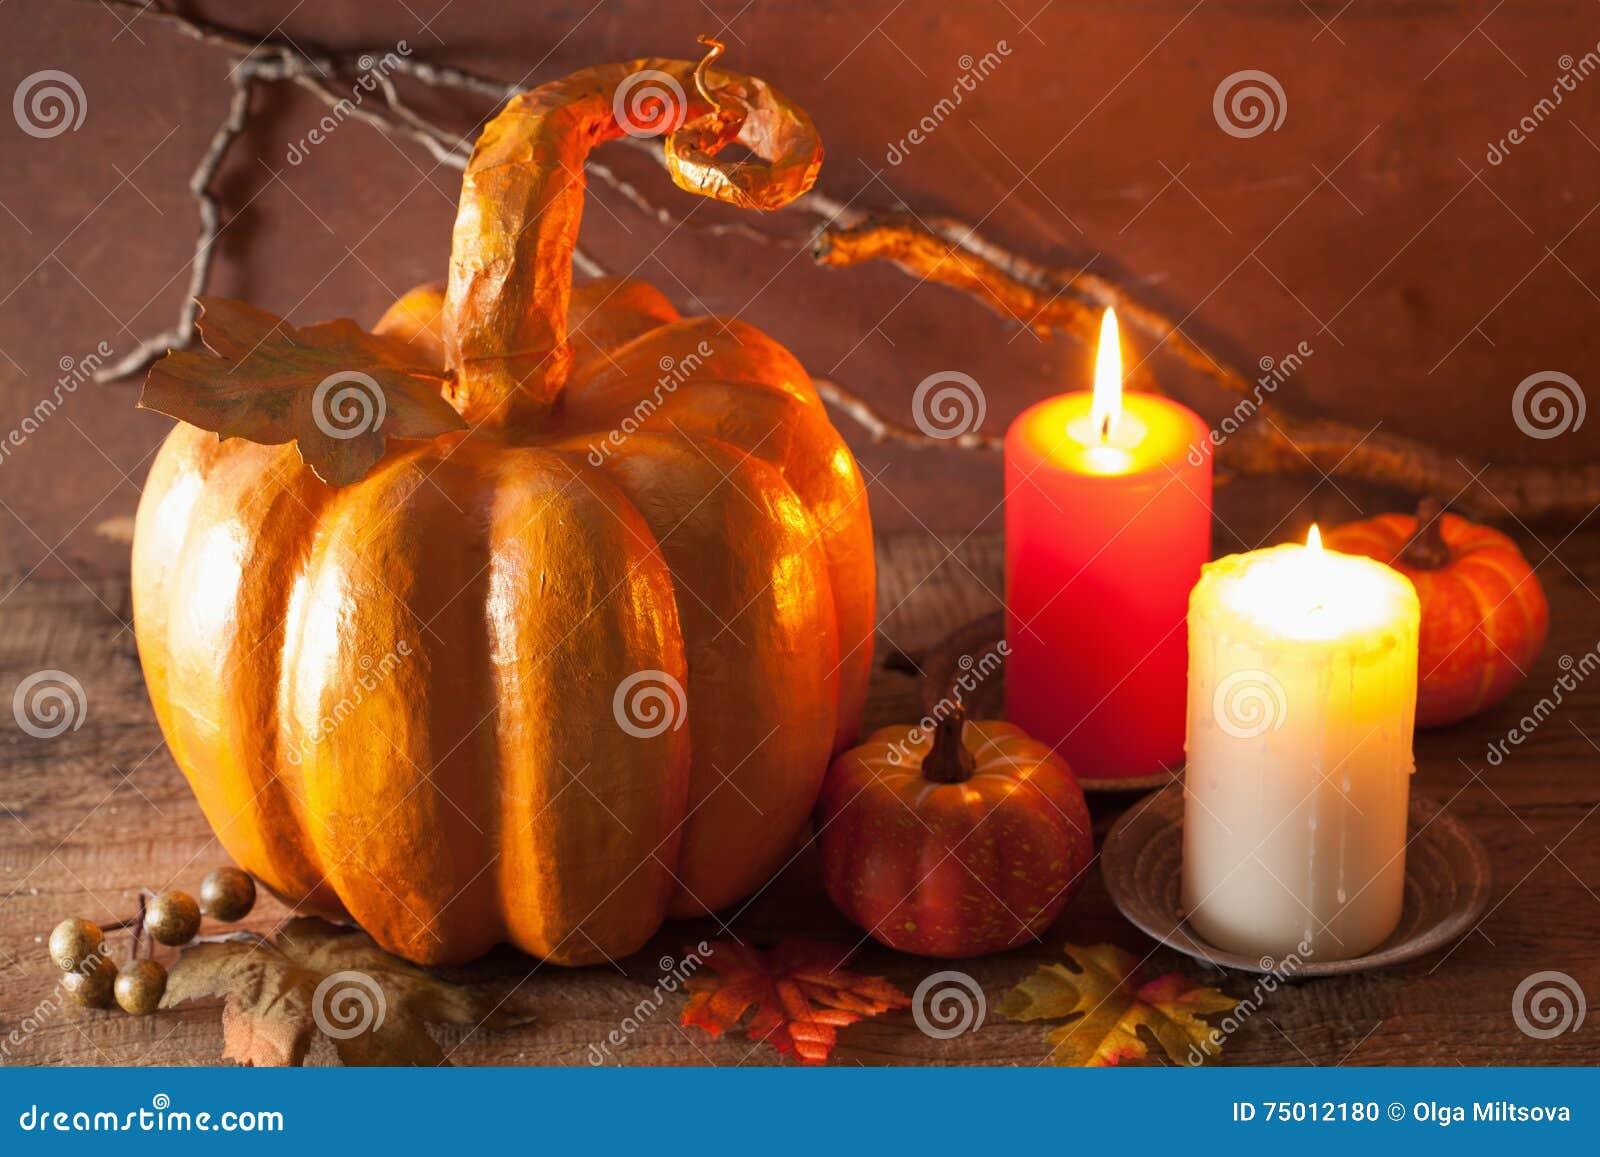 Zucca Halloween Cartapesta.Zucca Della Cartapesta E Foglie Di Autunno Dorate Decorative Per Hal